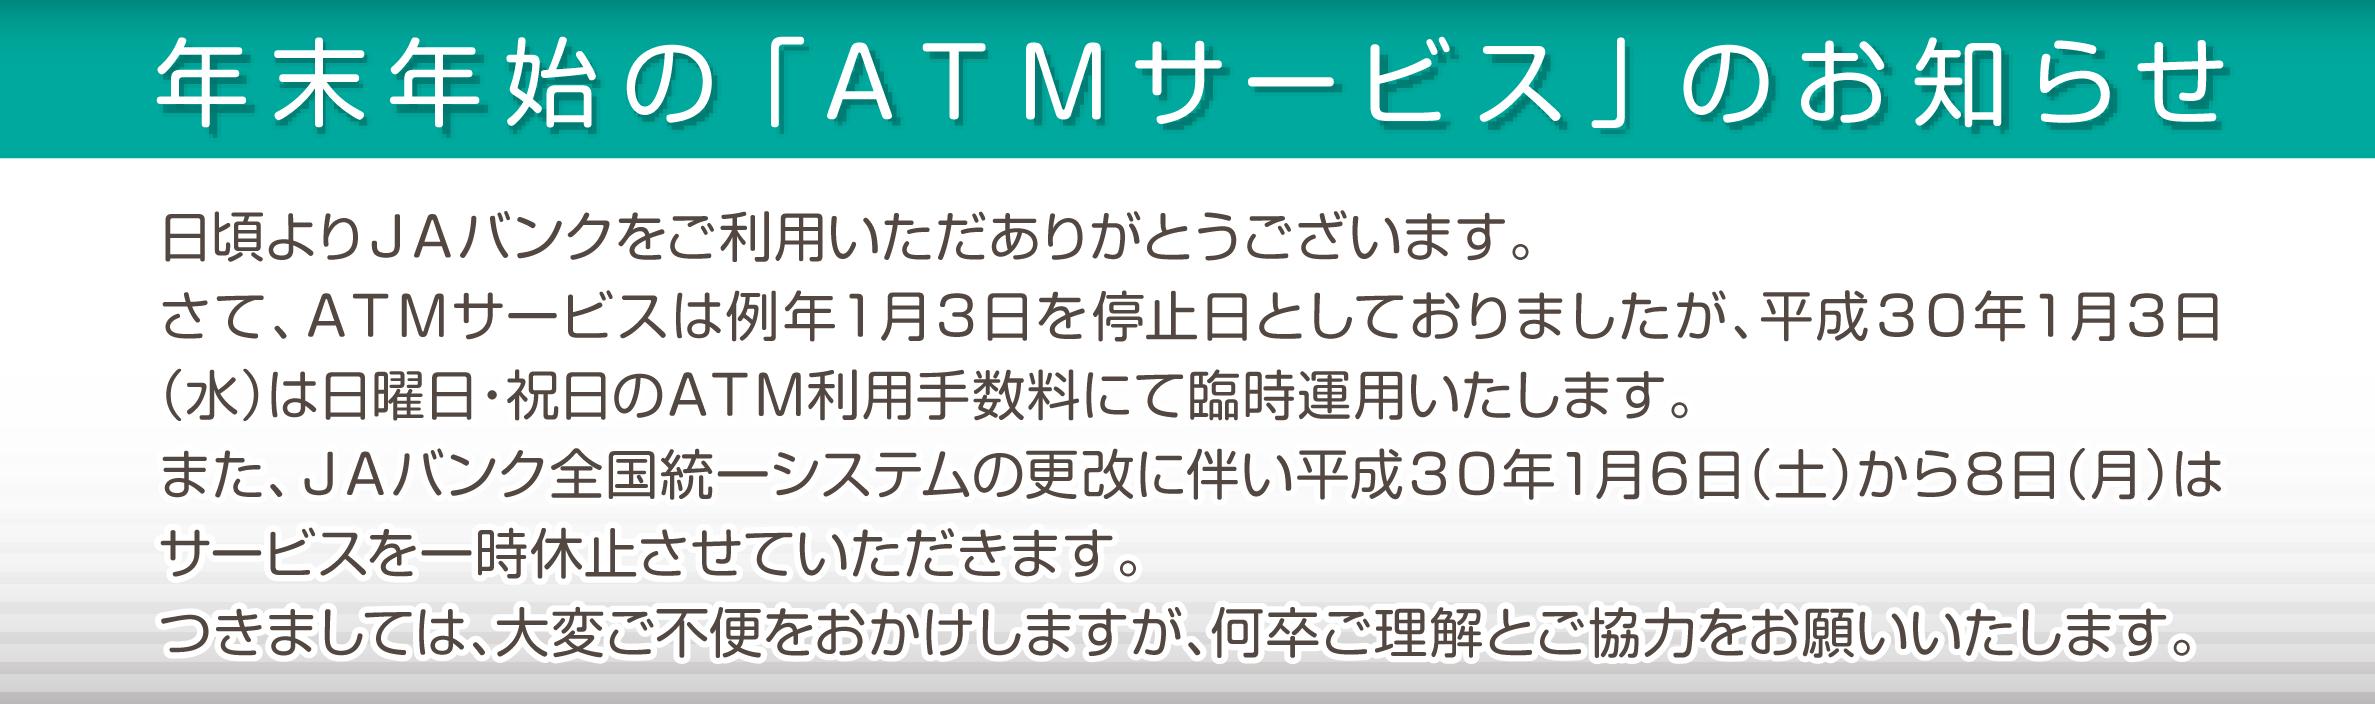 bana_atm